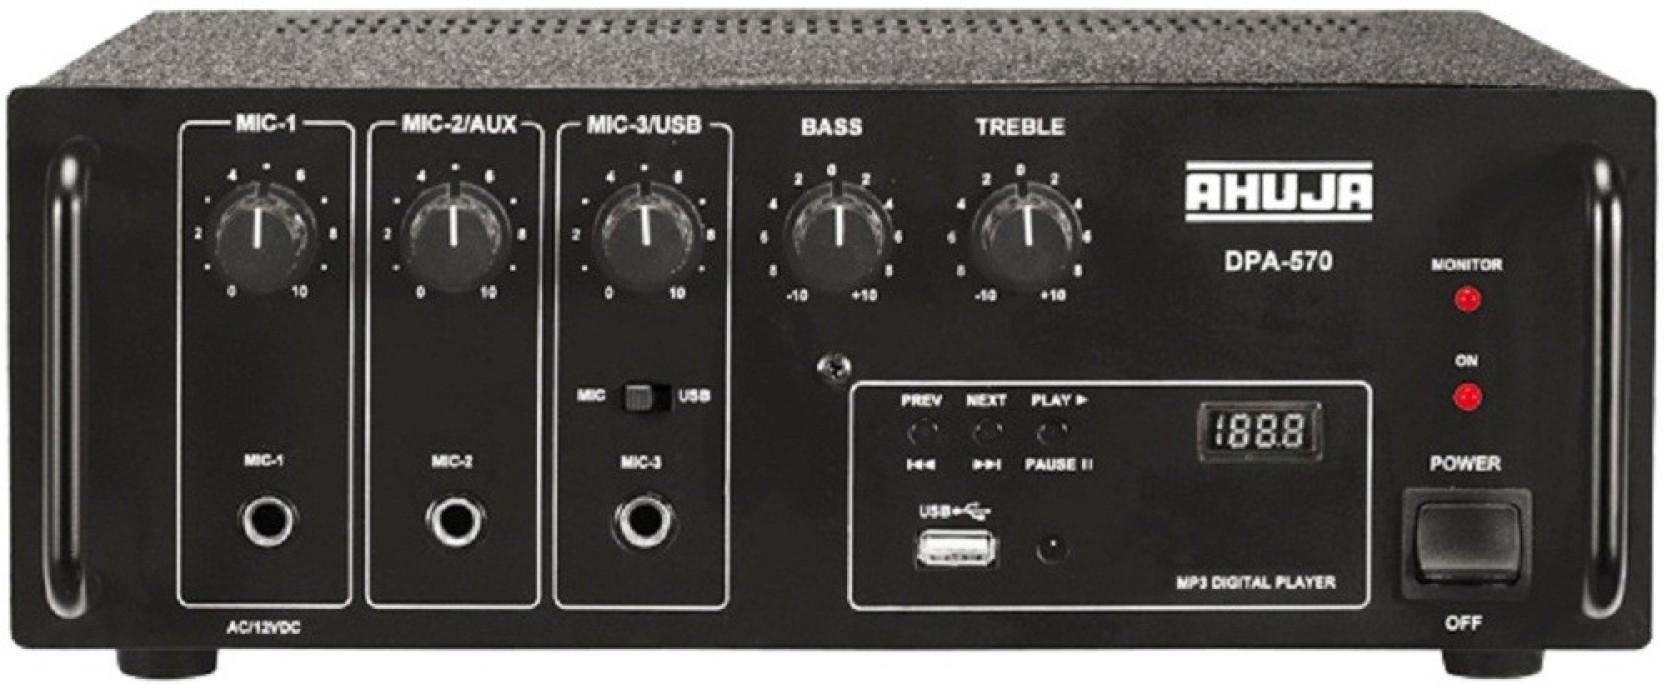 Ahuja Dpa 570 50 W Av Power Amplifier Price In India Buy 58 Audio Add To Cart